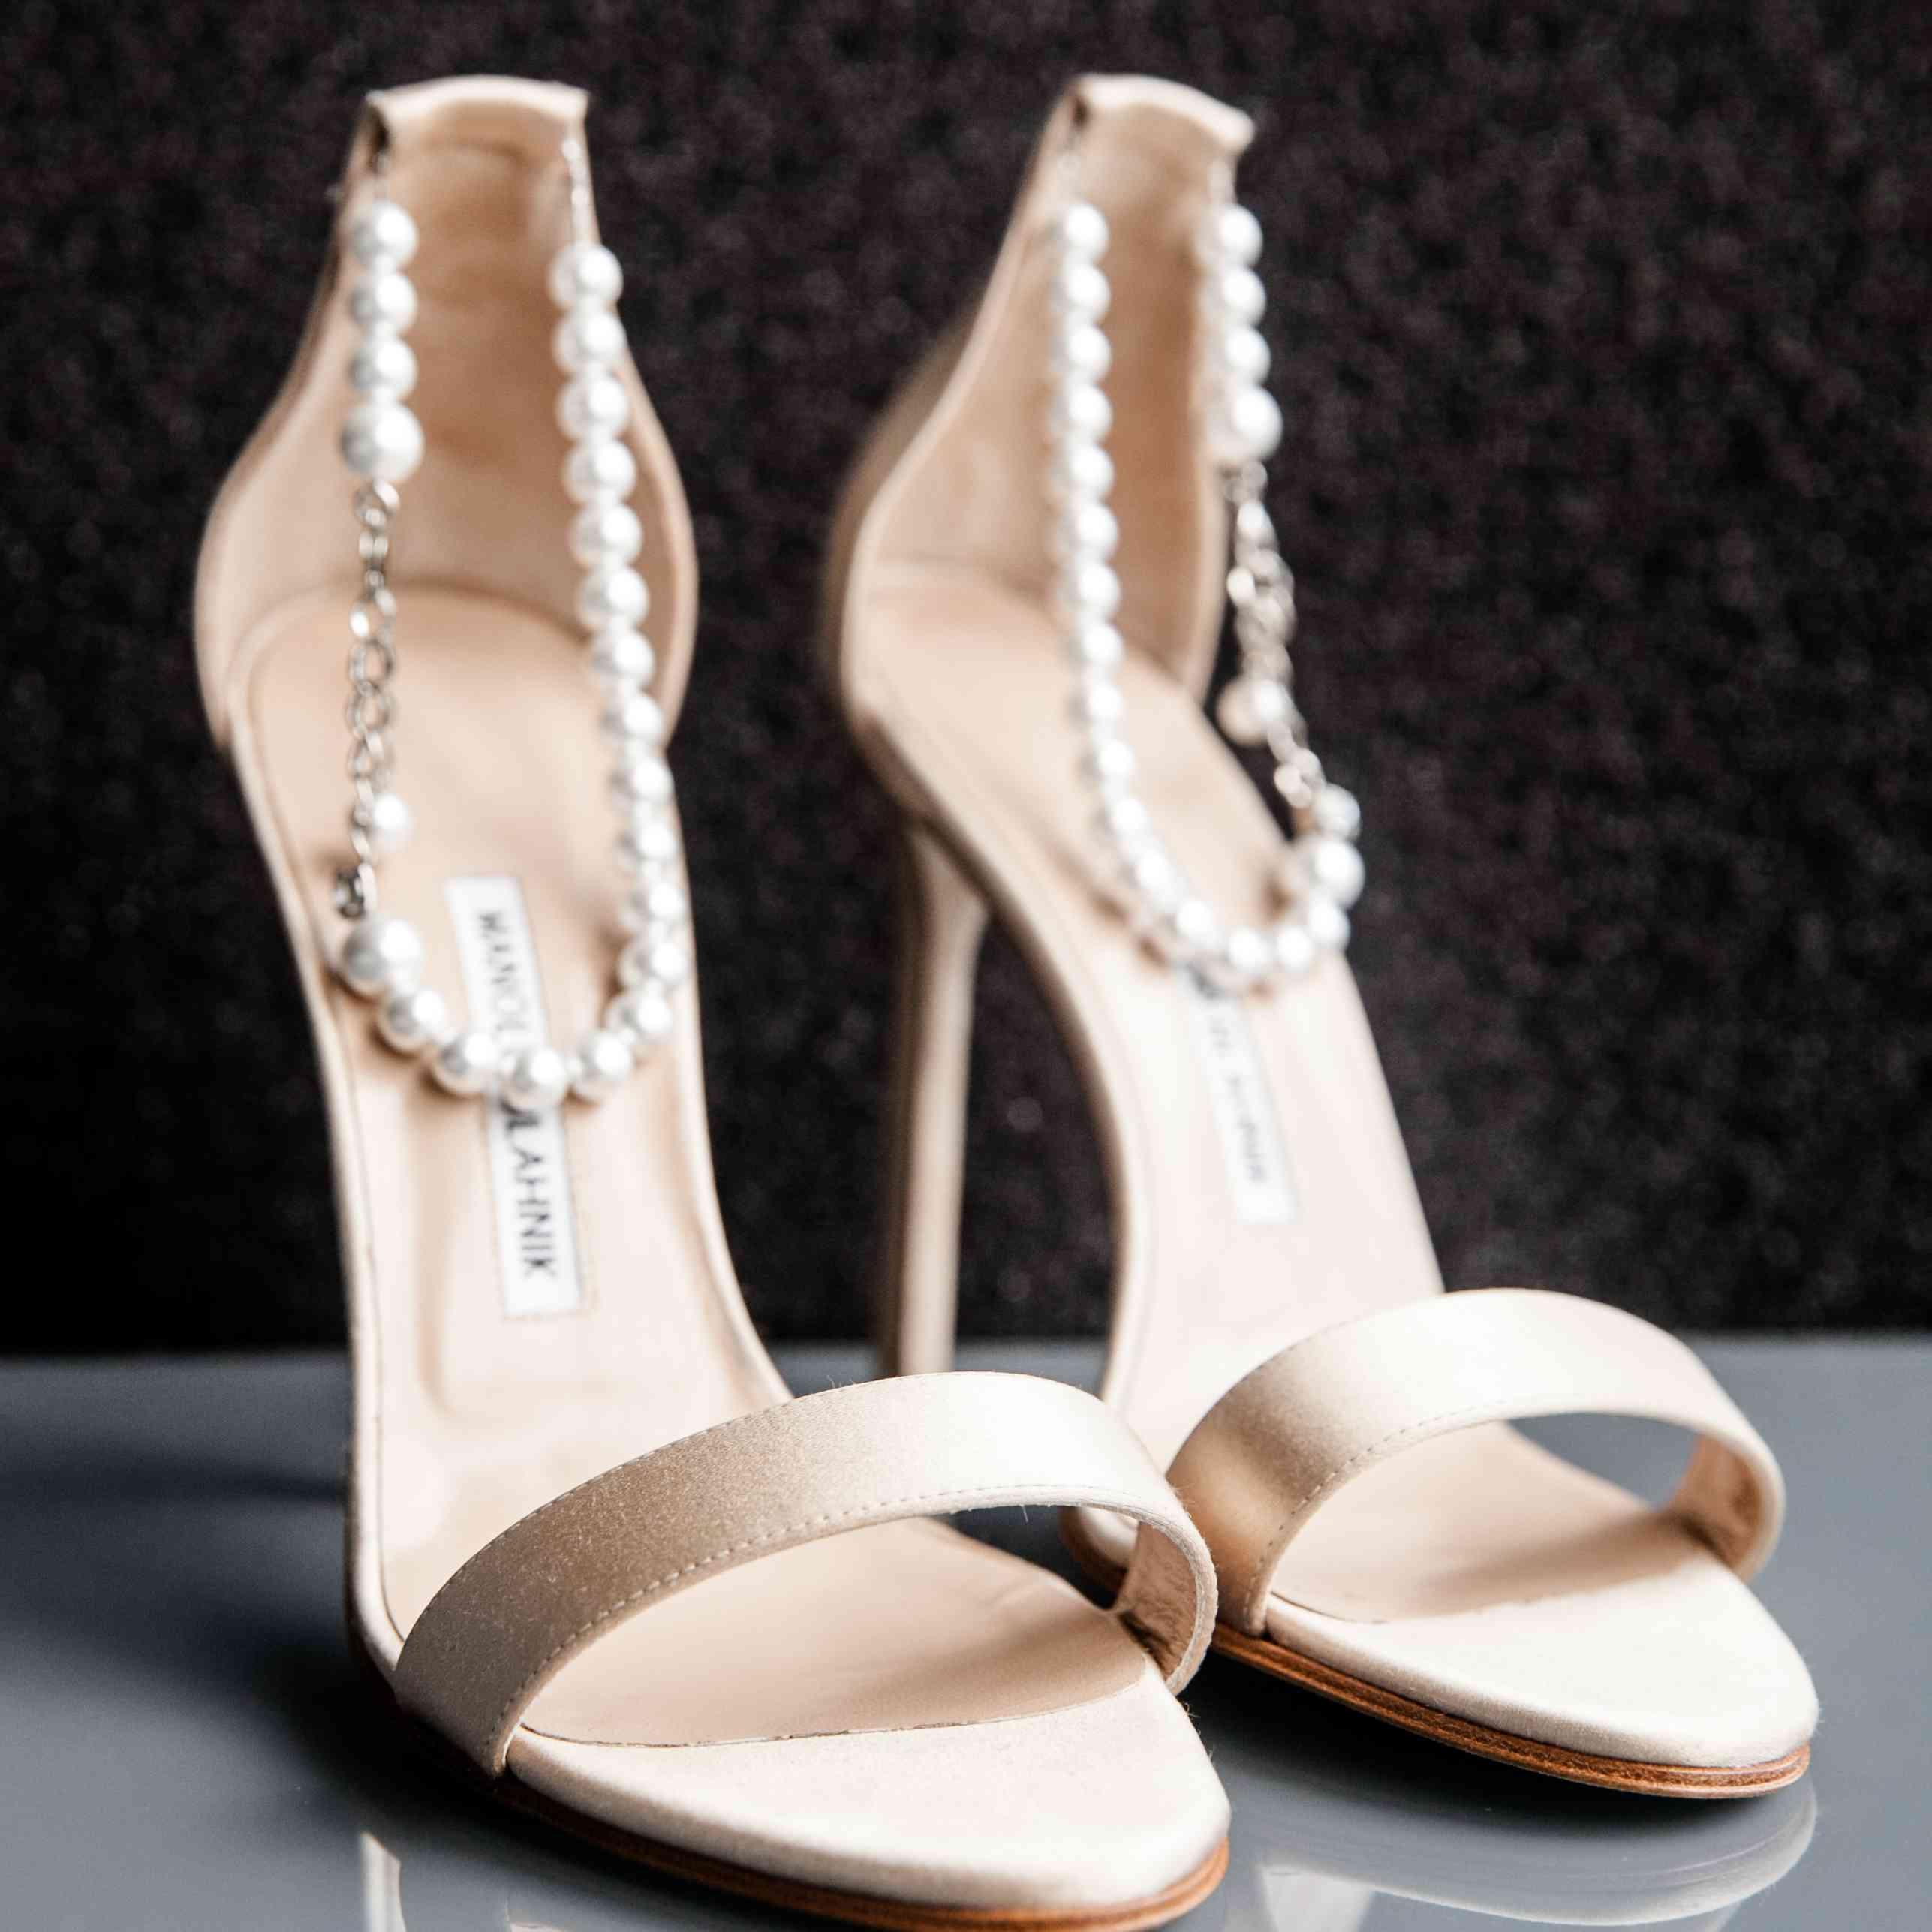 <p>Manolo Blahnik Heels With Pearls</p><br><br>